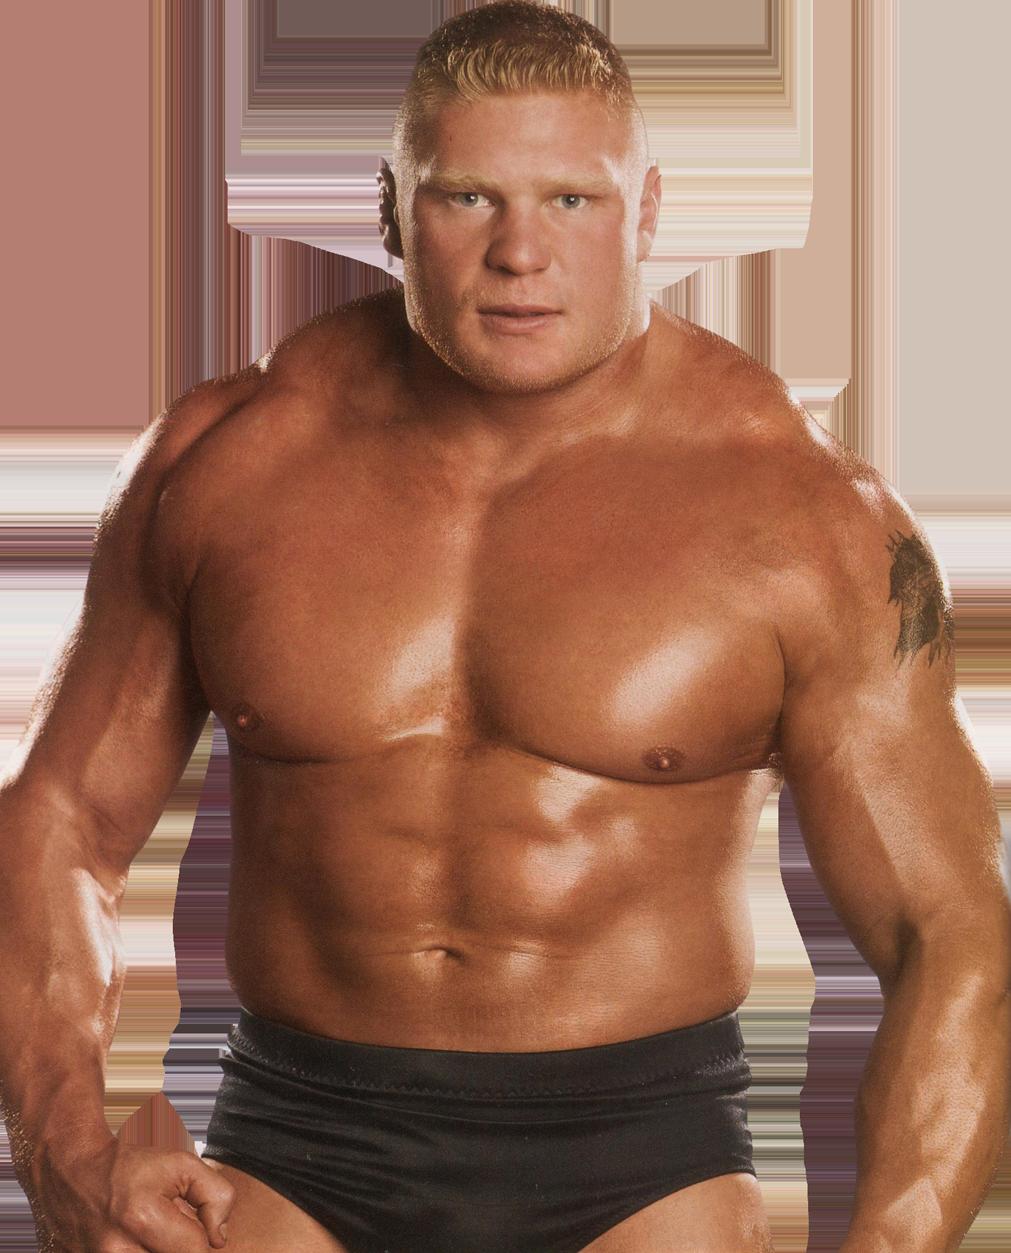 Brock Lesnar Clipart PNG Image-Brock Lesnar Clipart PNG Image-4